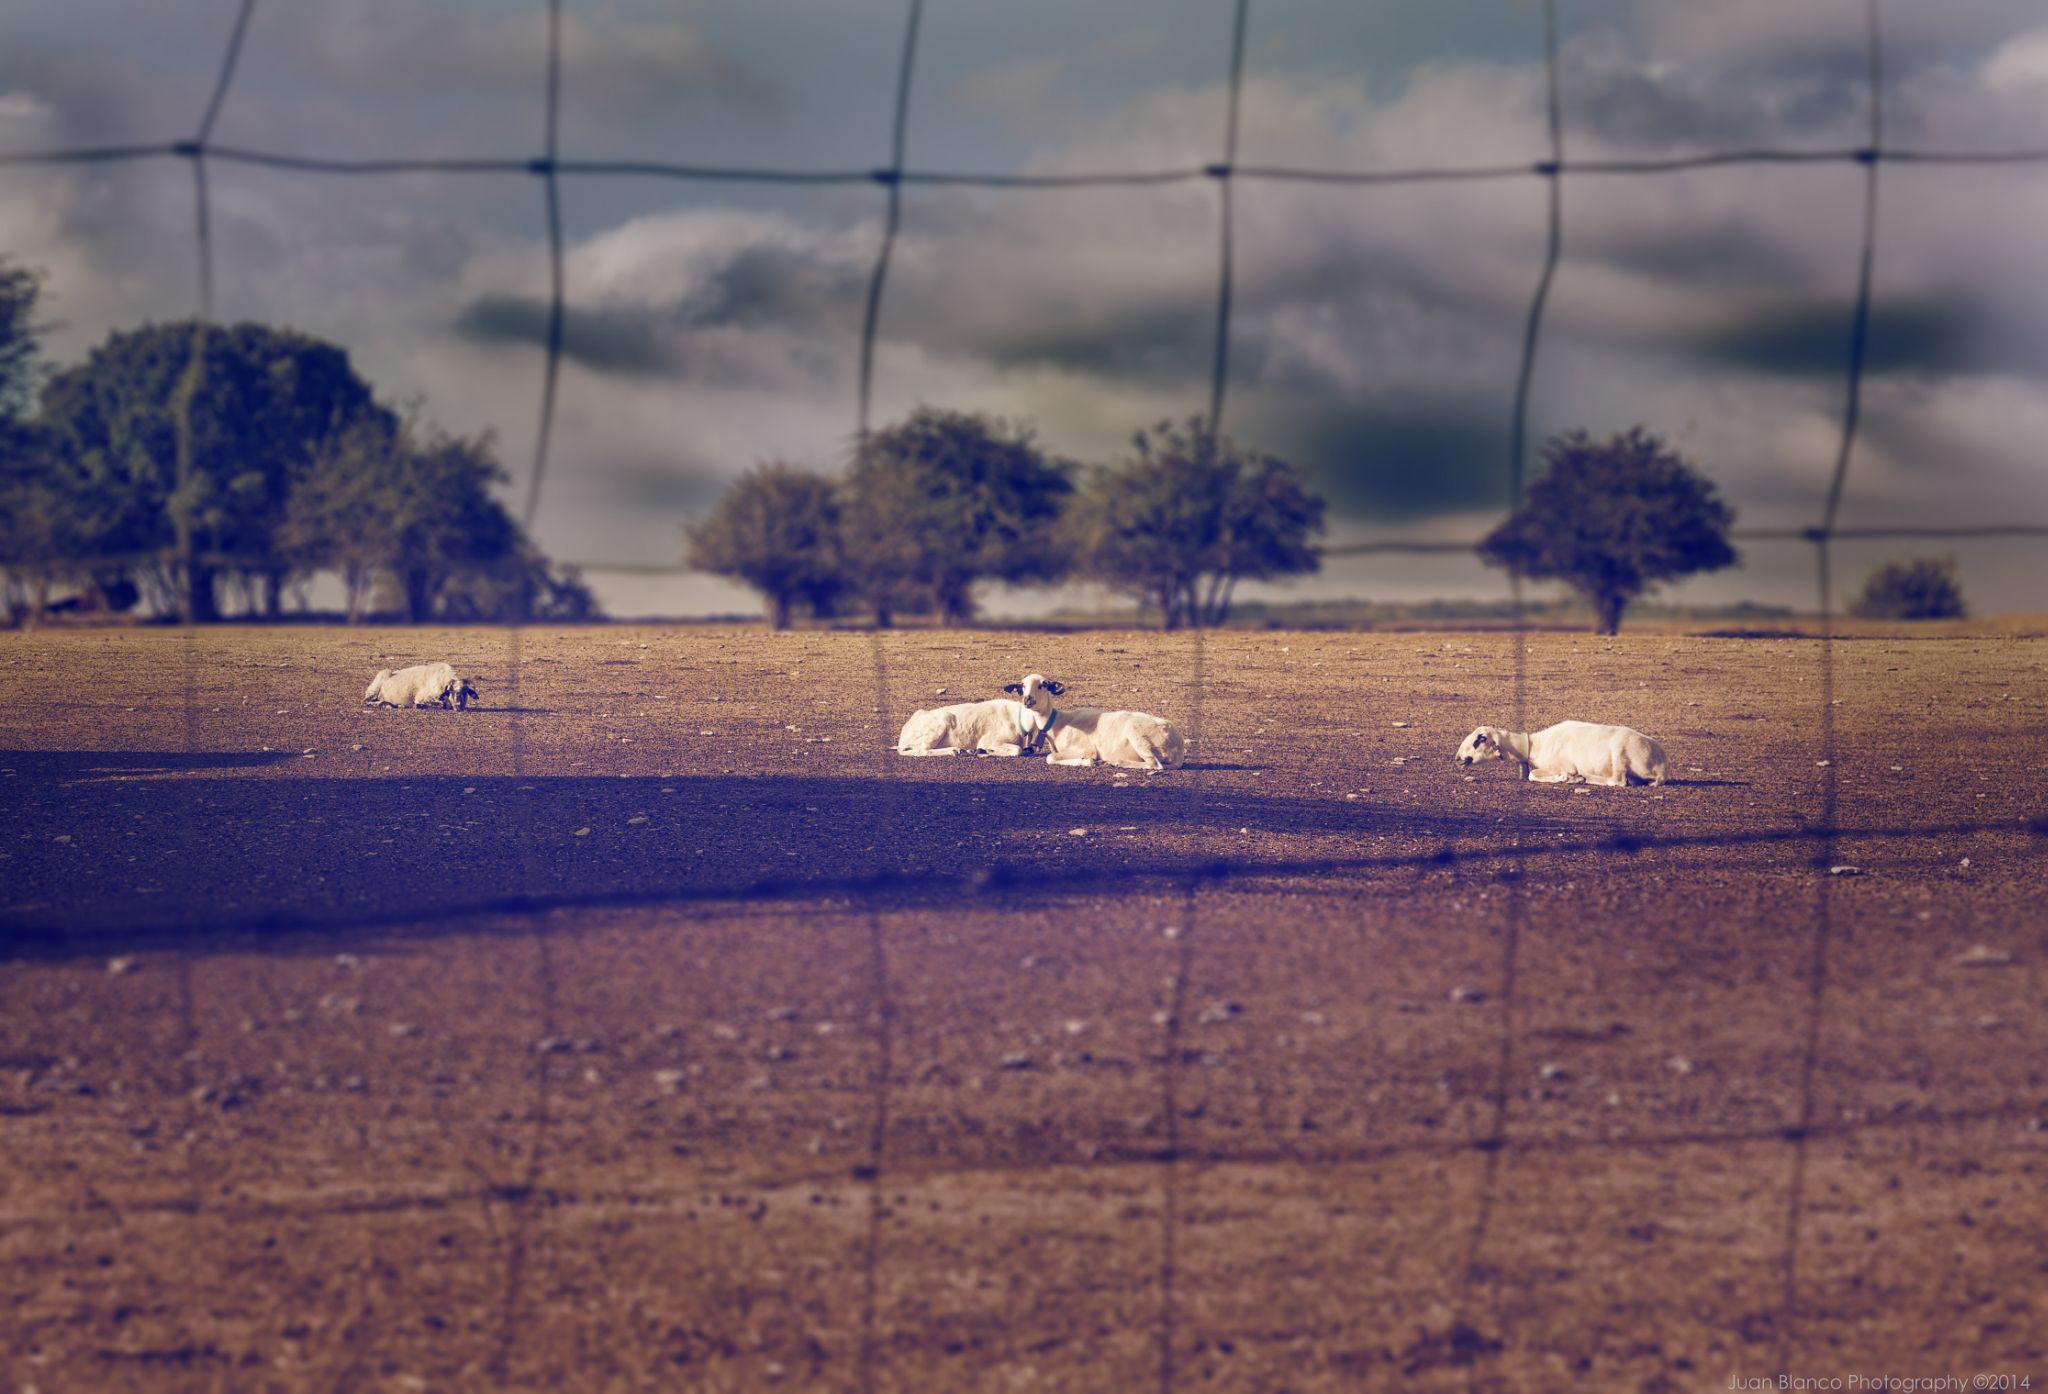 """Descansando"" by JuanBlancoPhotography"